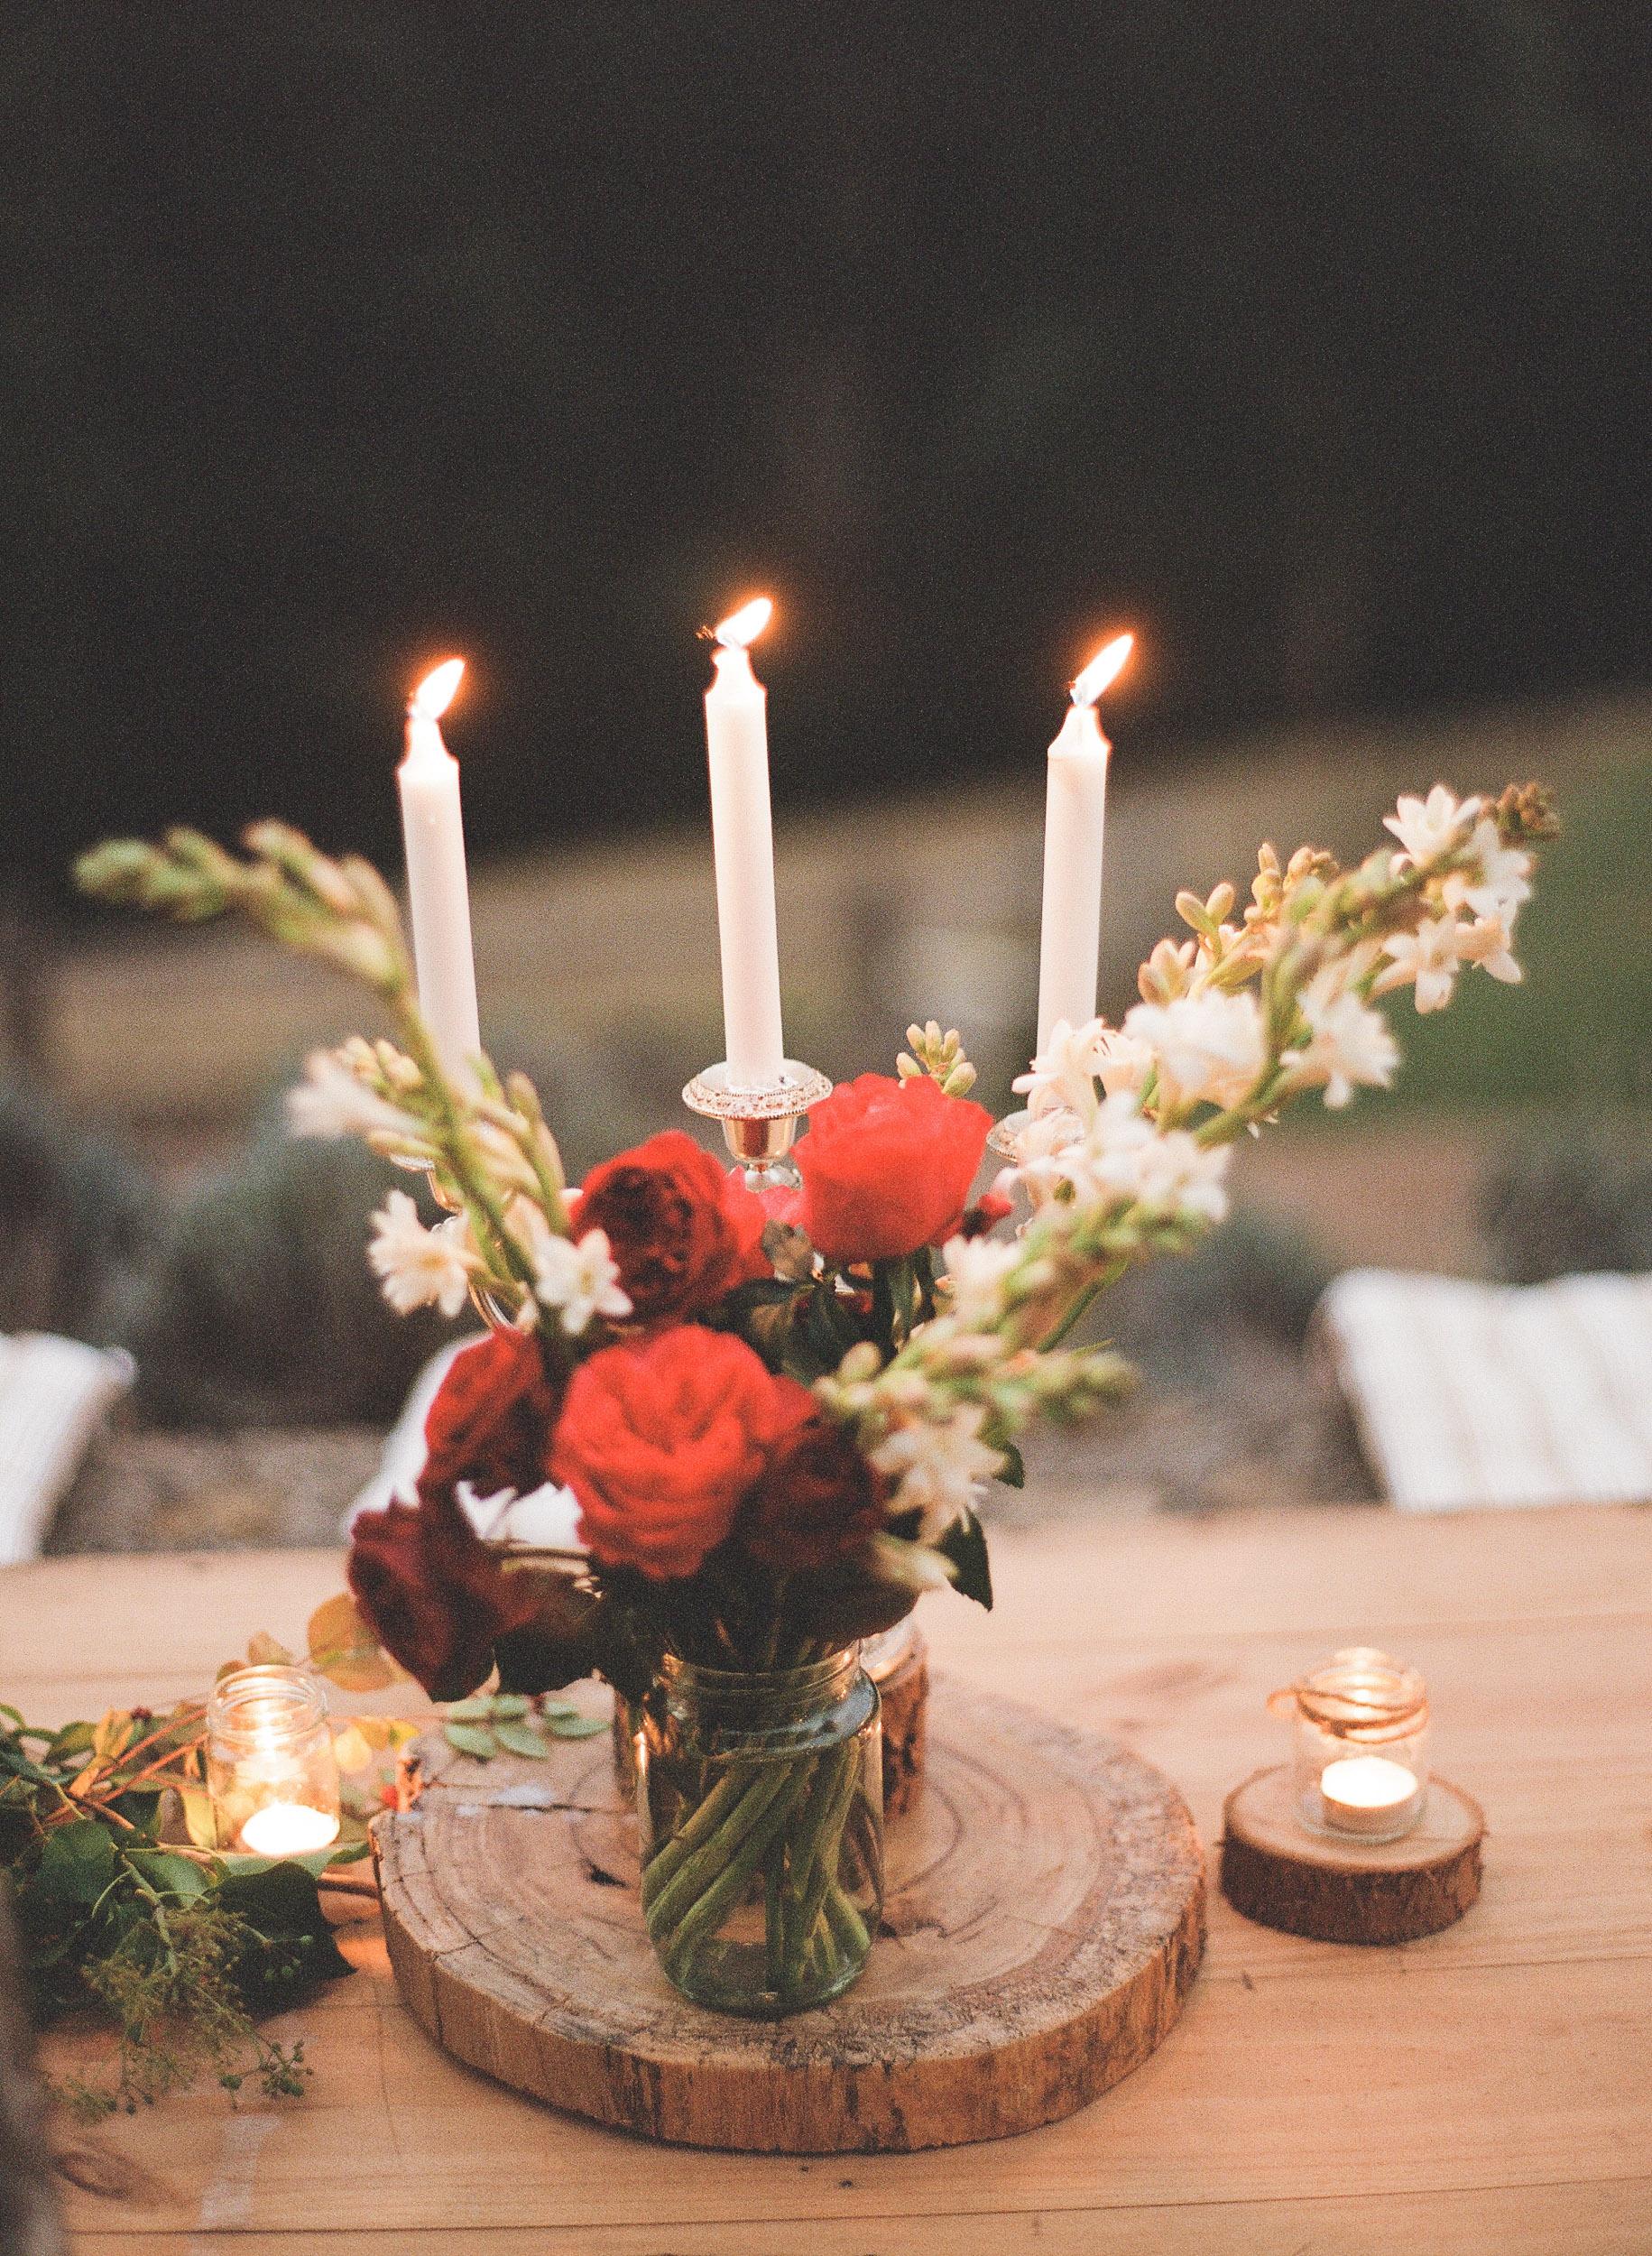 wedding (13 of 24) - 000053170009.jpg